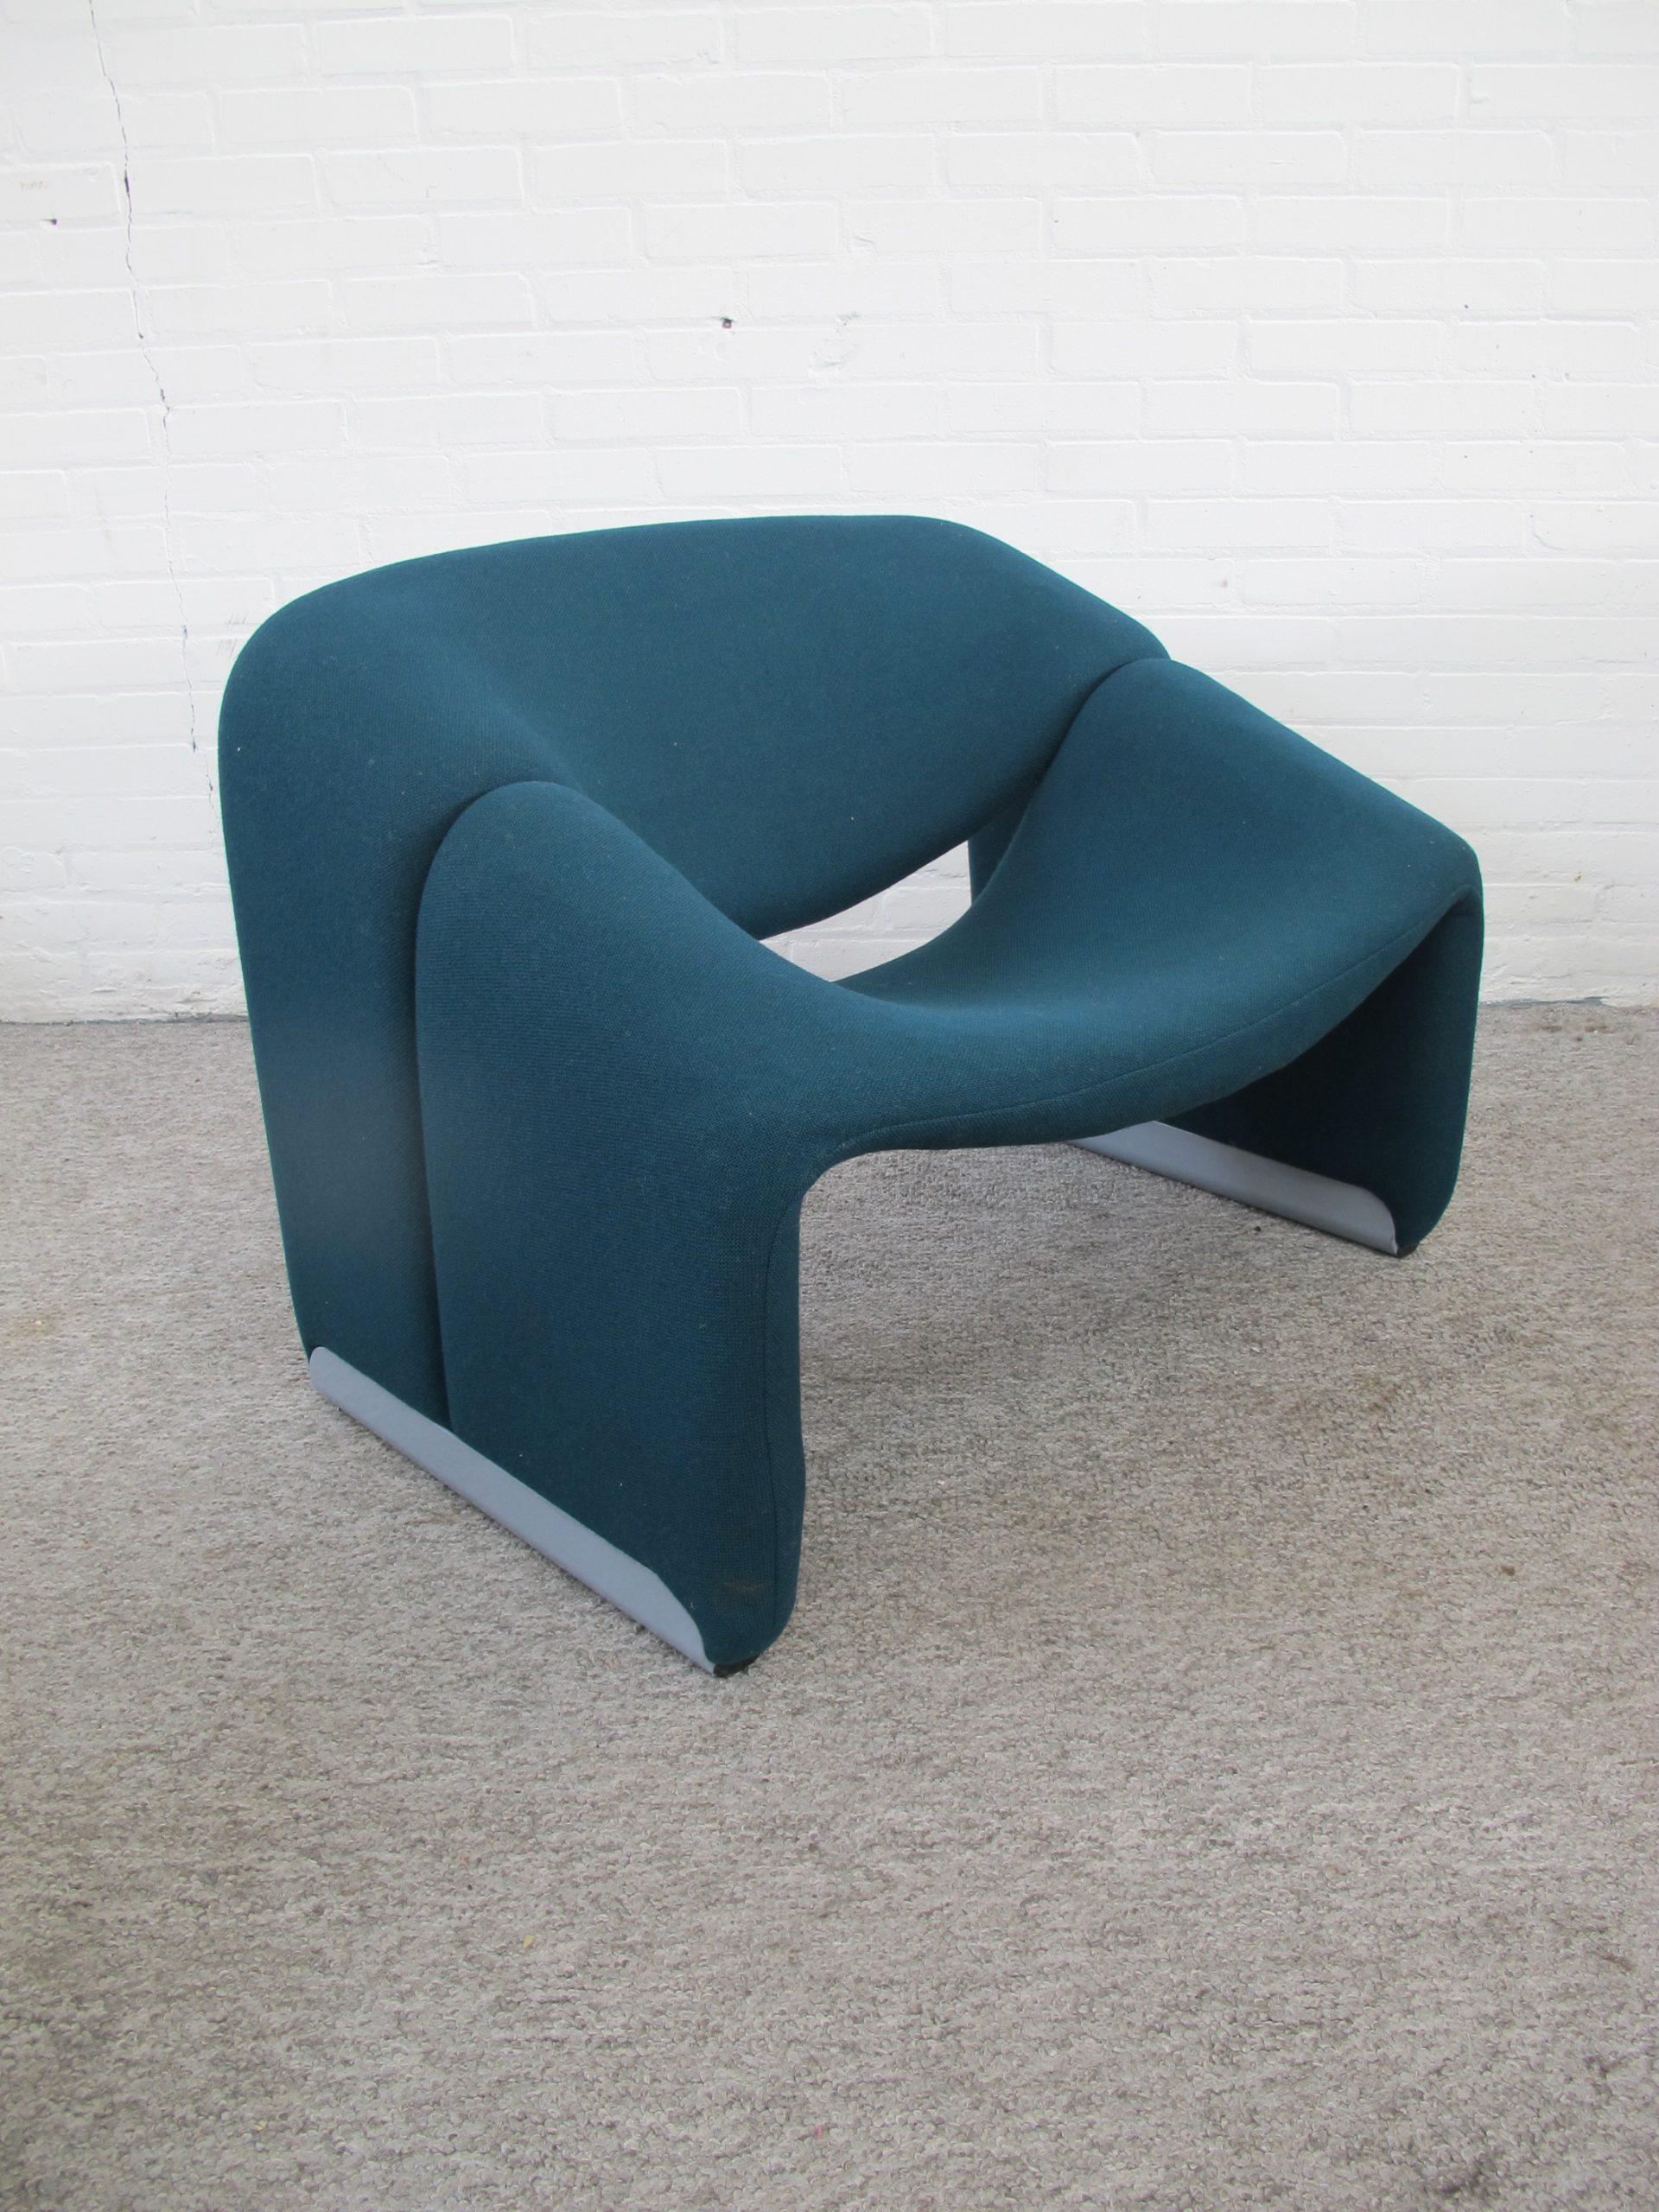 fauteuil Groovy lounge chair F598 Pierre Paulin Artifort vintage midcentury